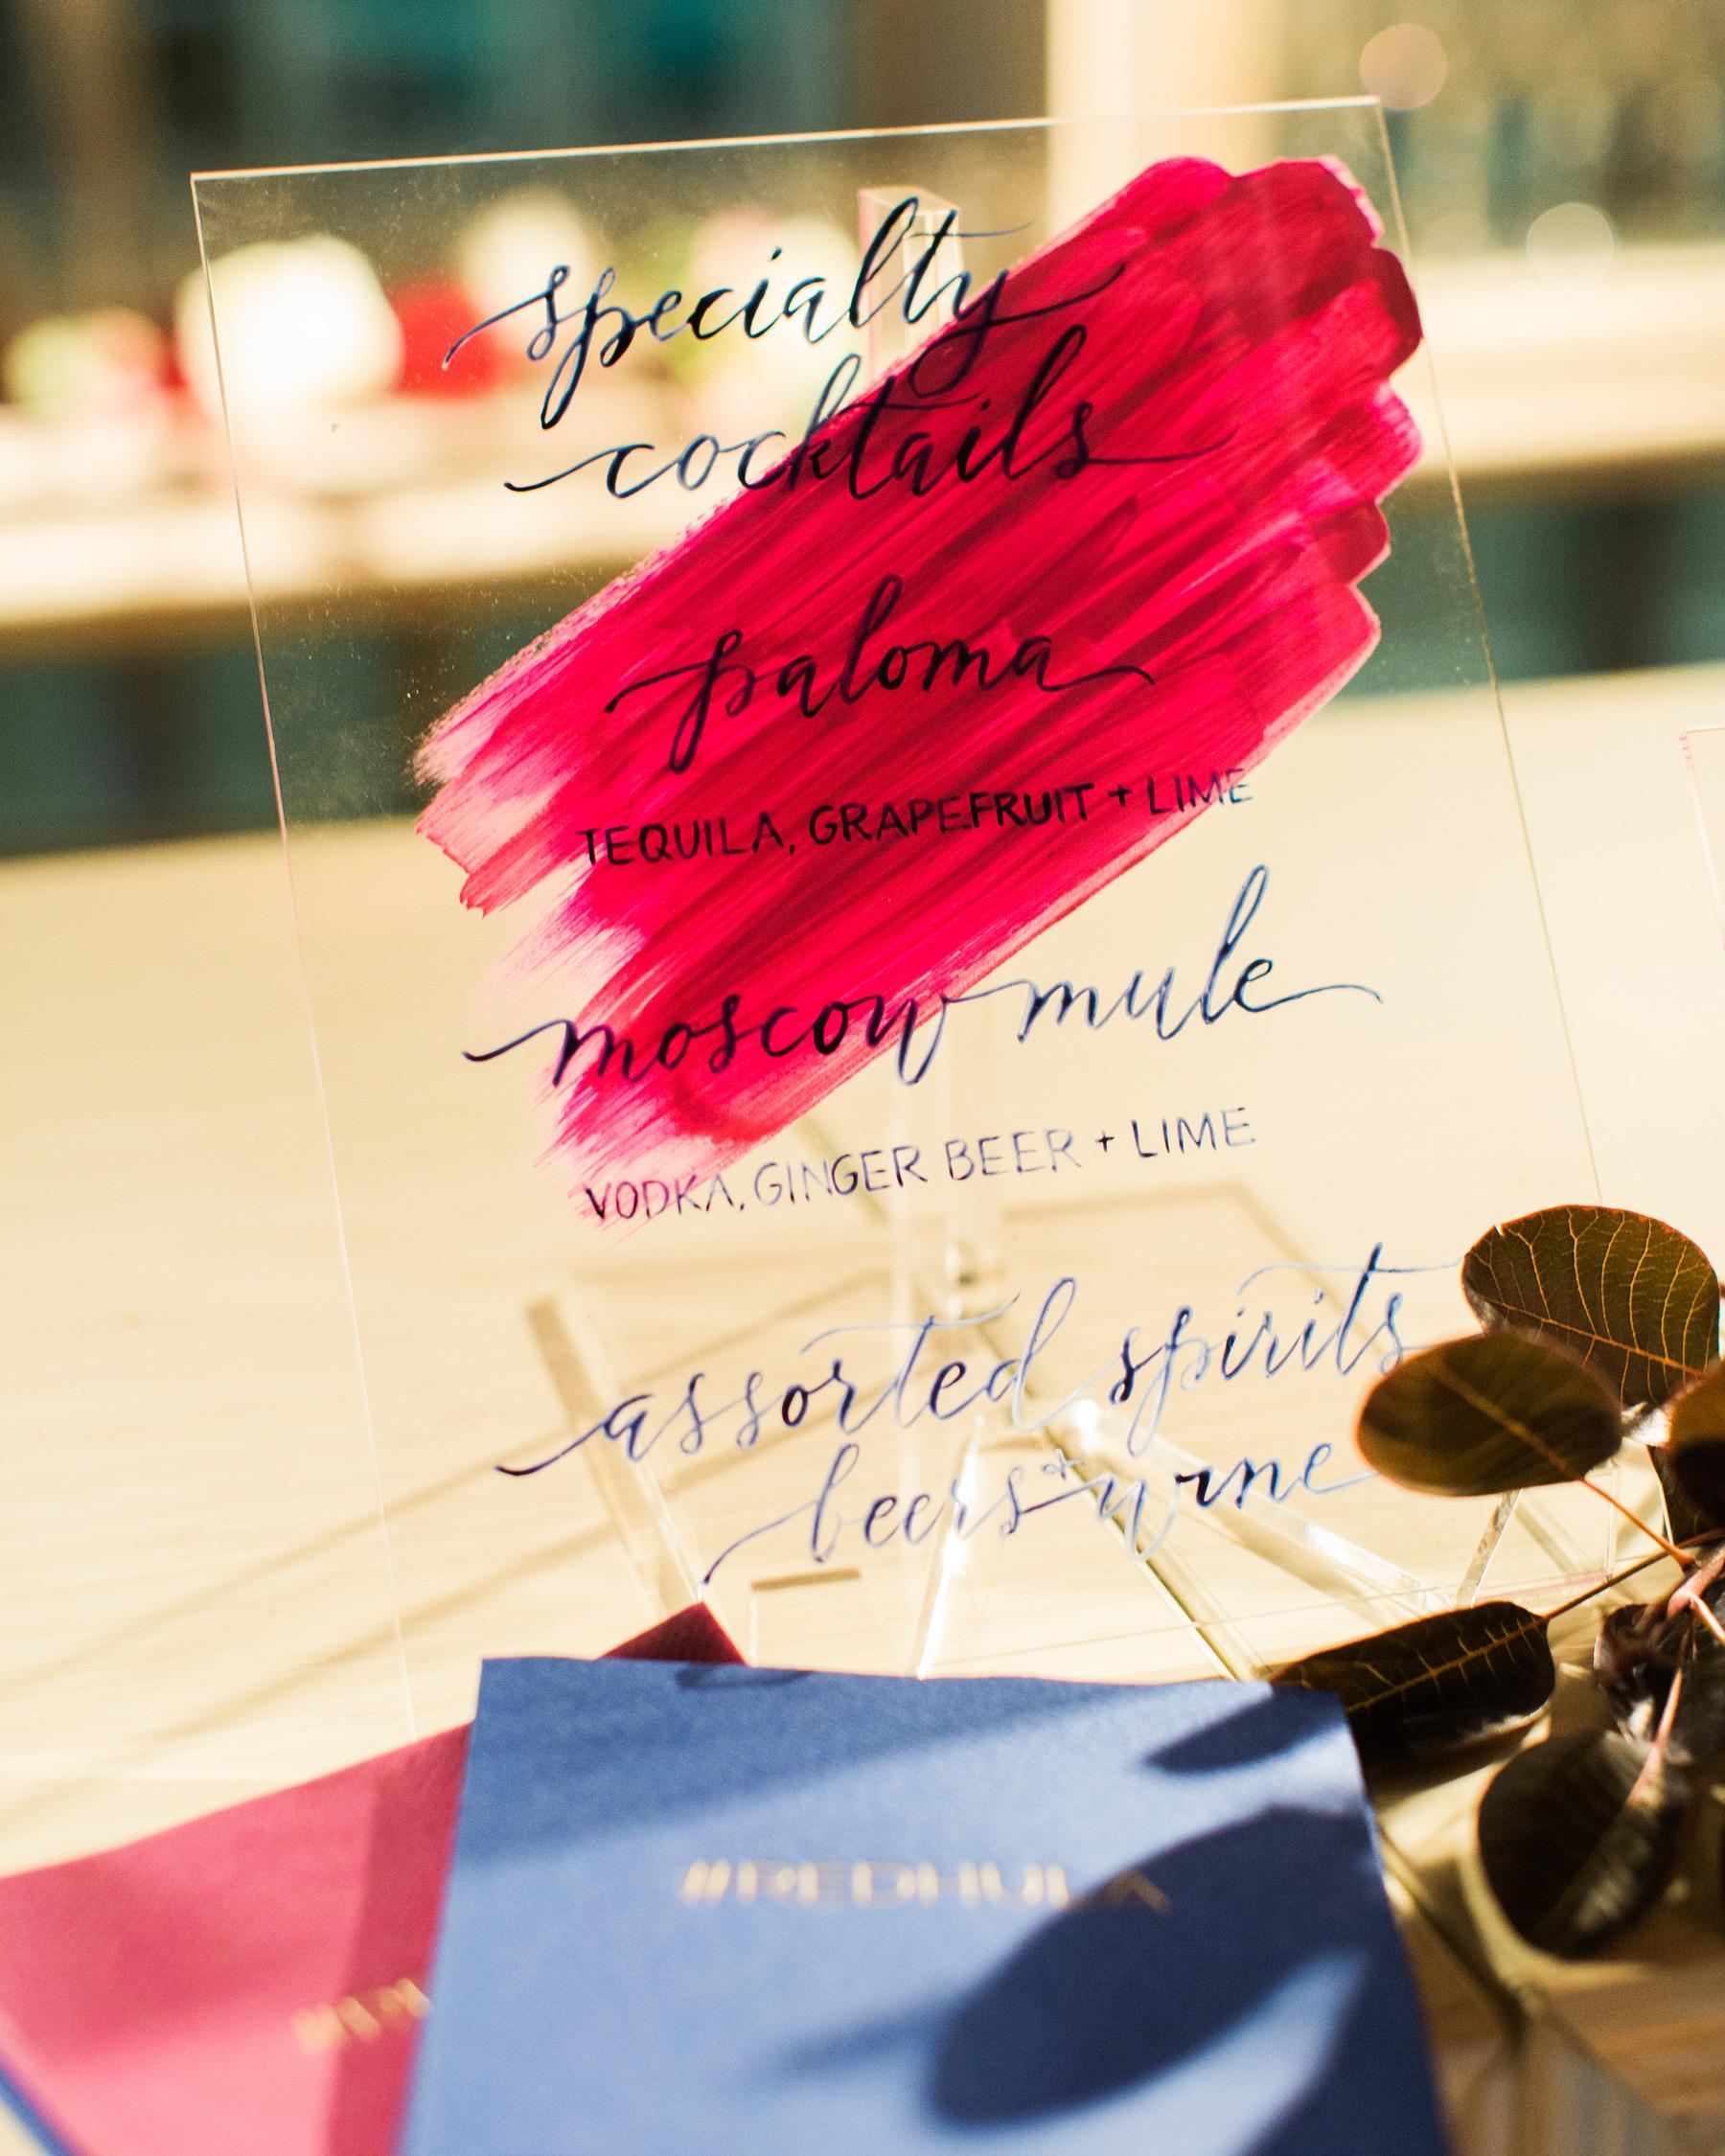 danielle-brian-wedding-cocktails-1142-s113001-0616.jpg